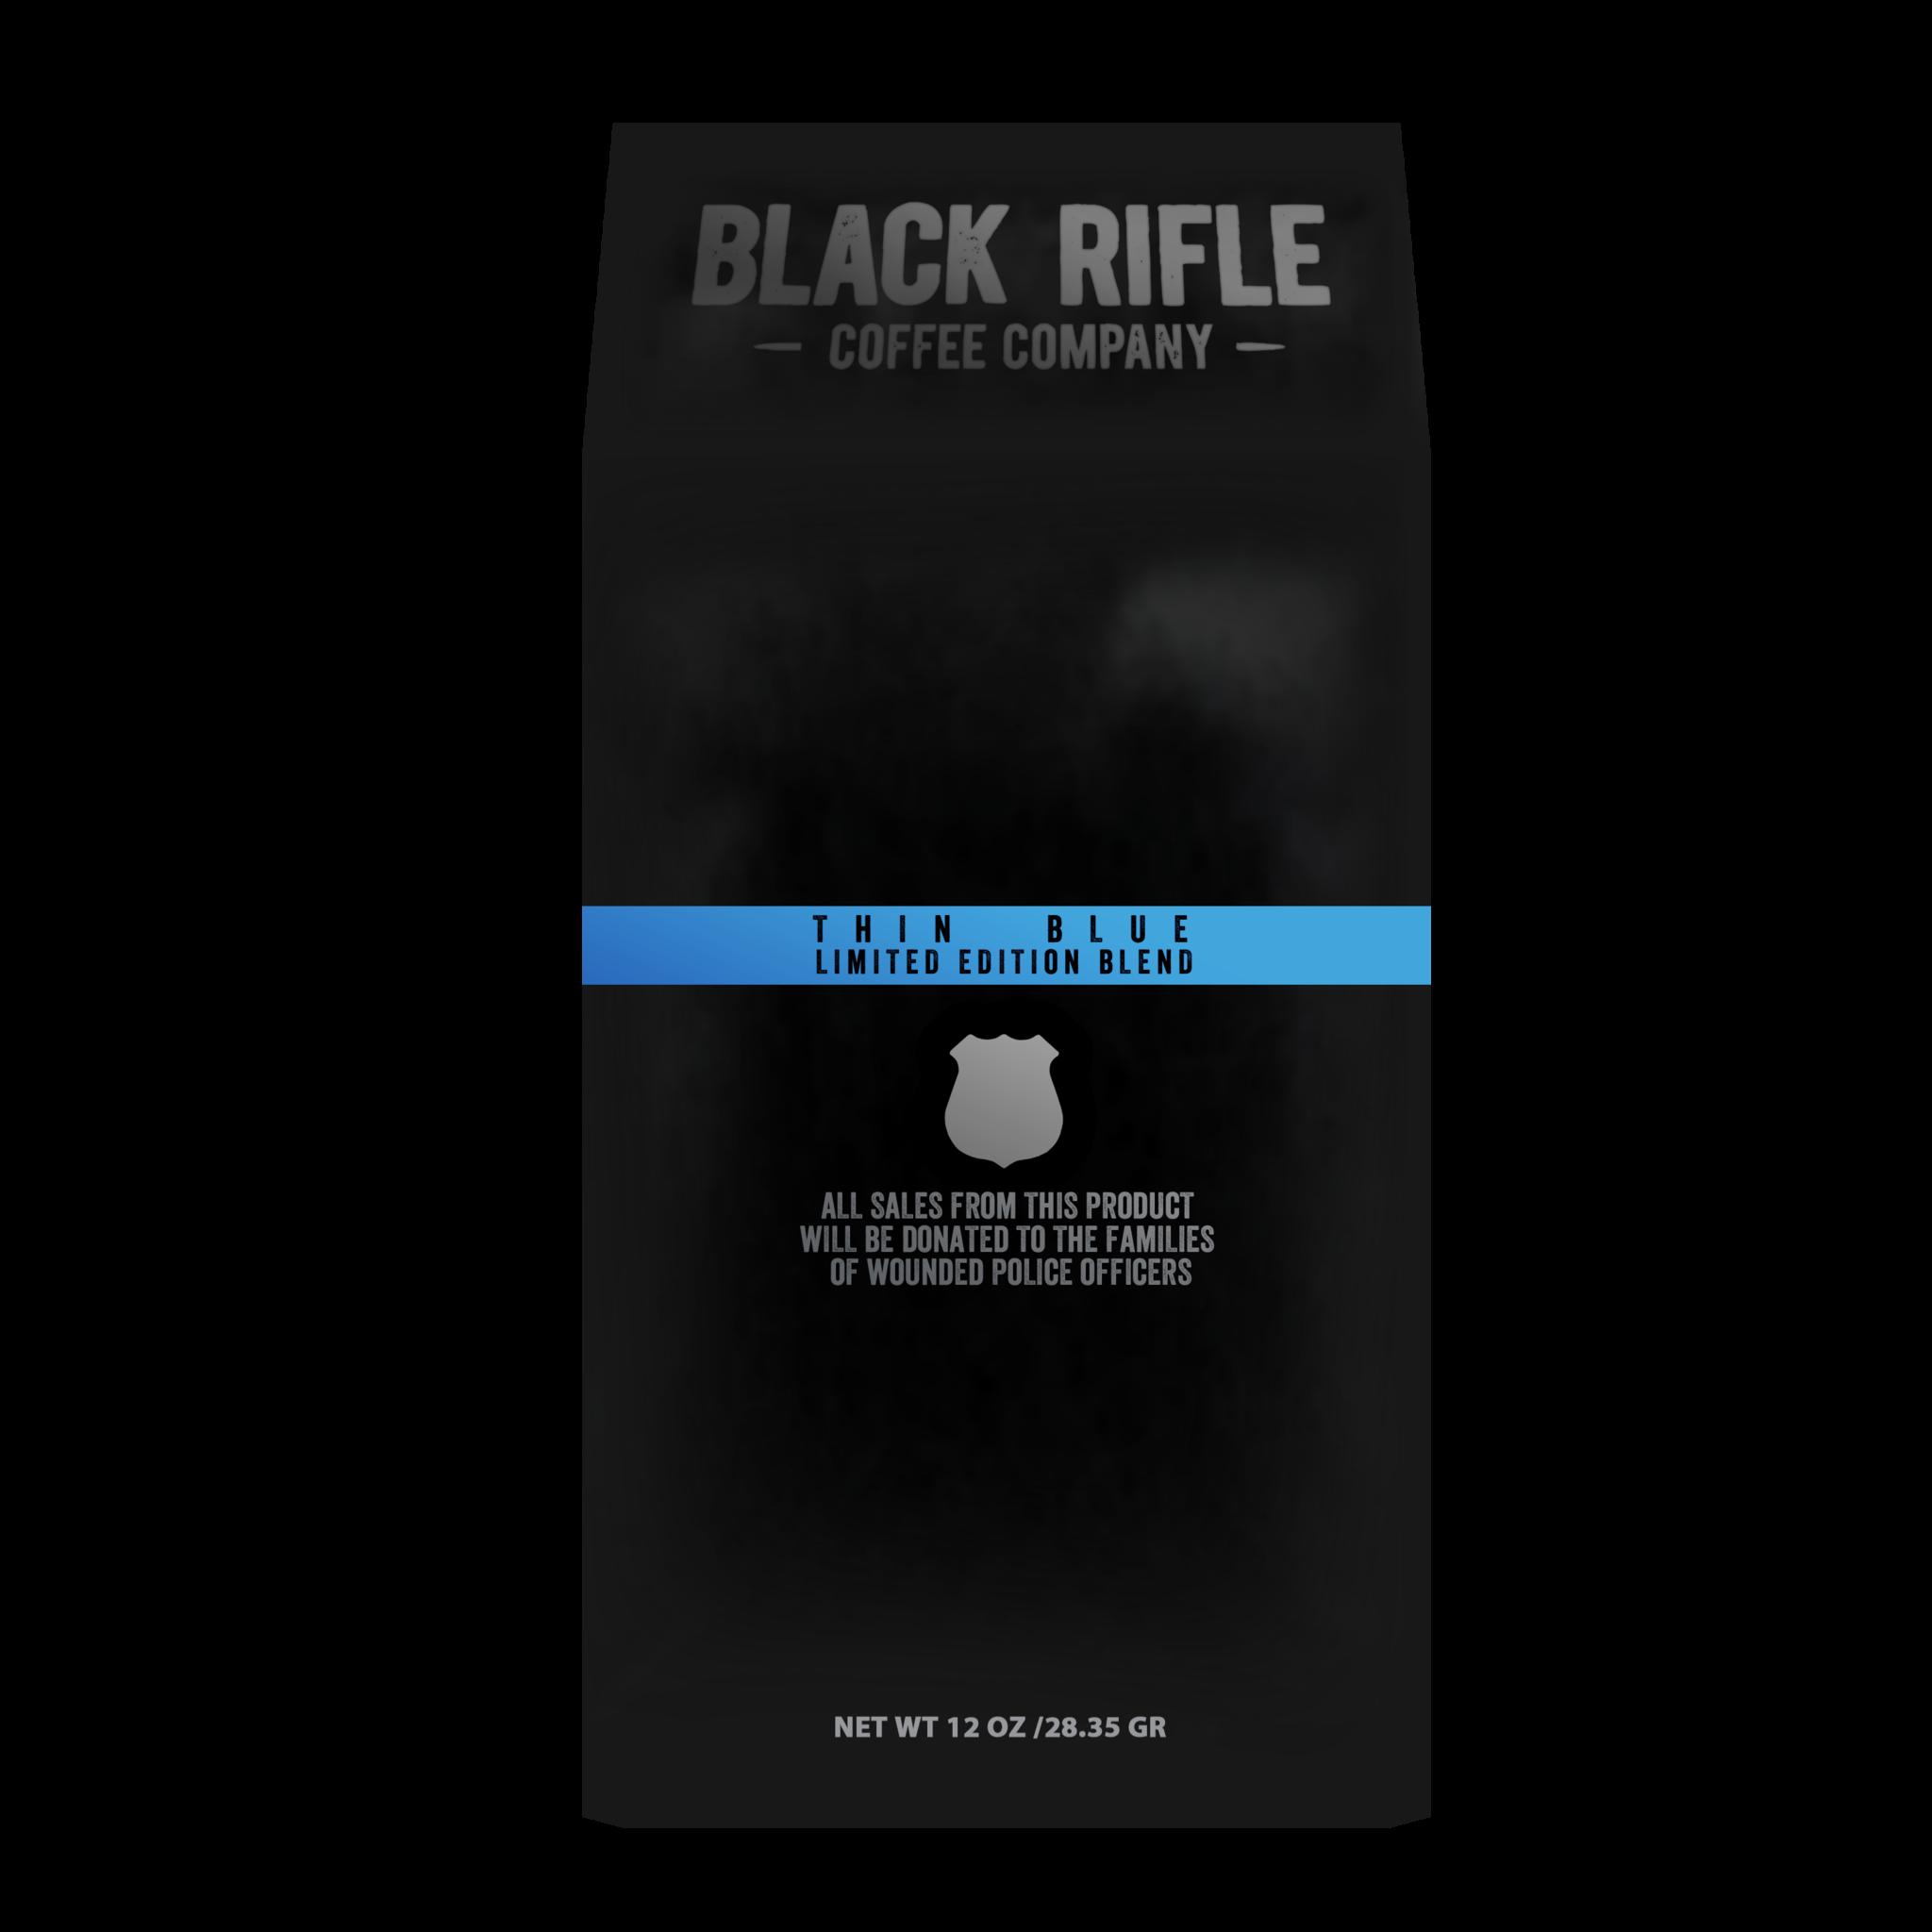 Thin Blue Line—Limited Edition Blend - Black Rifle Coffee Company